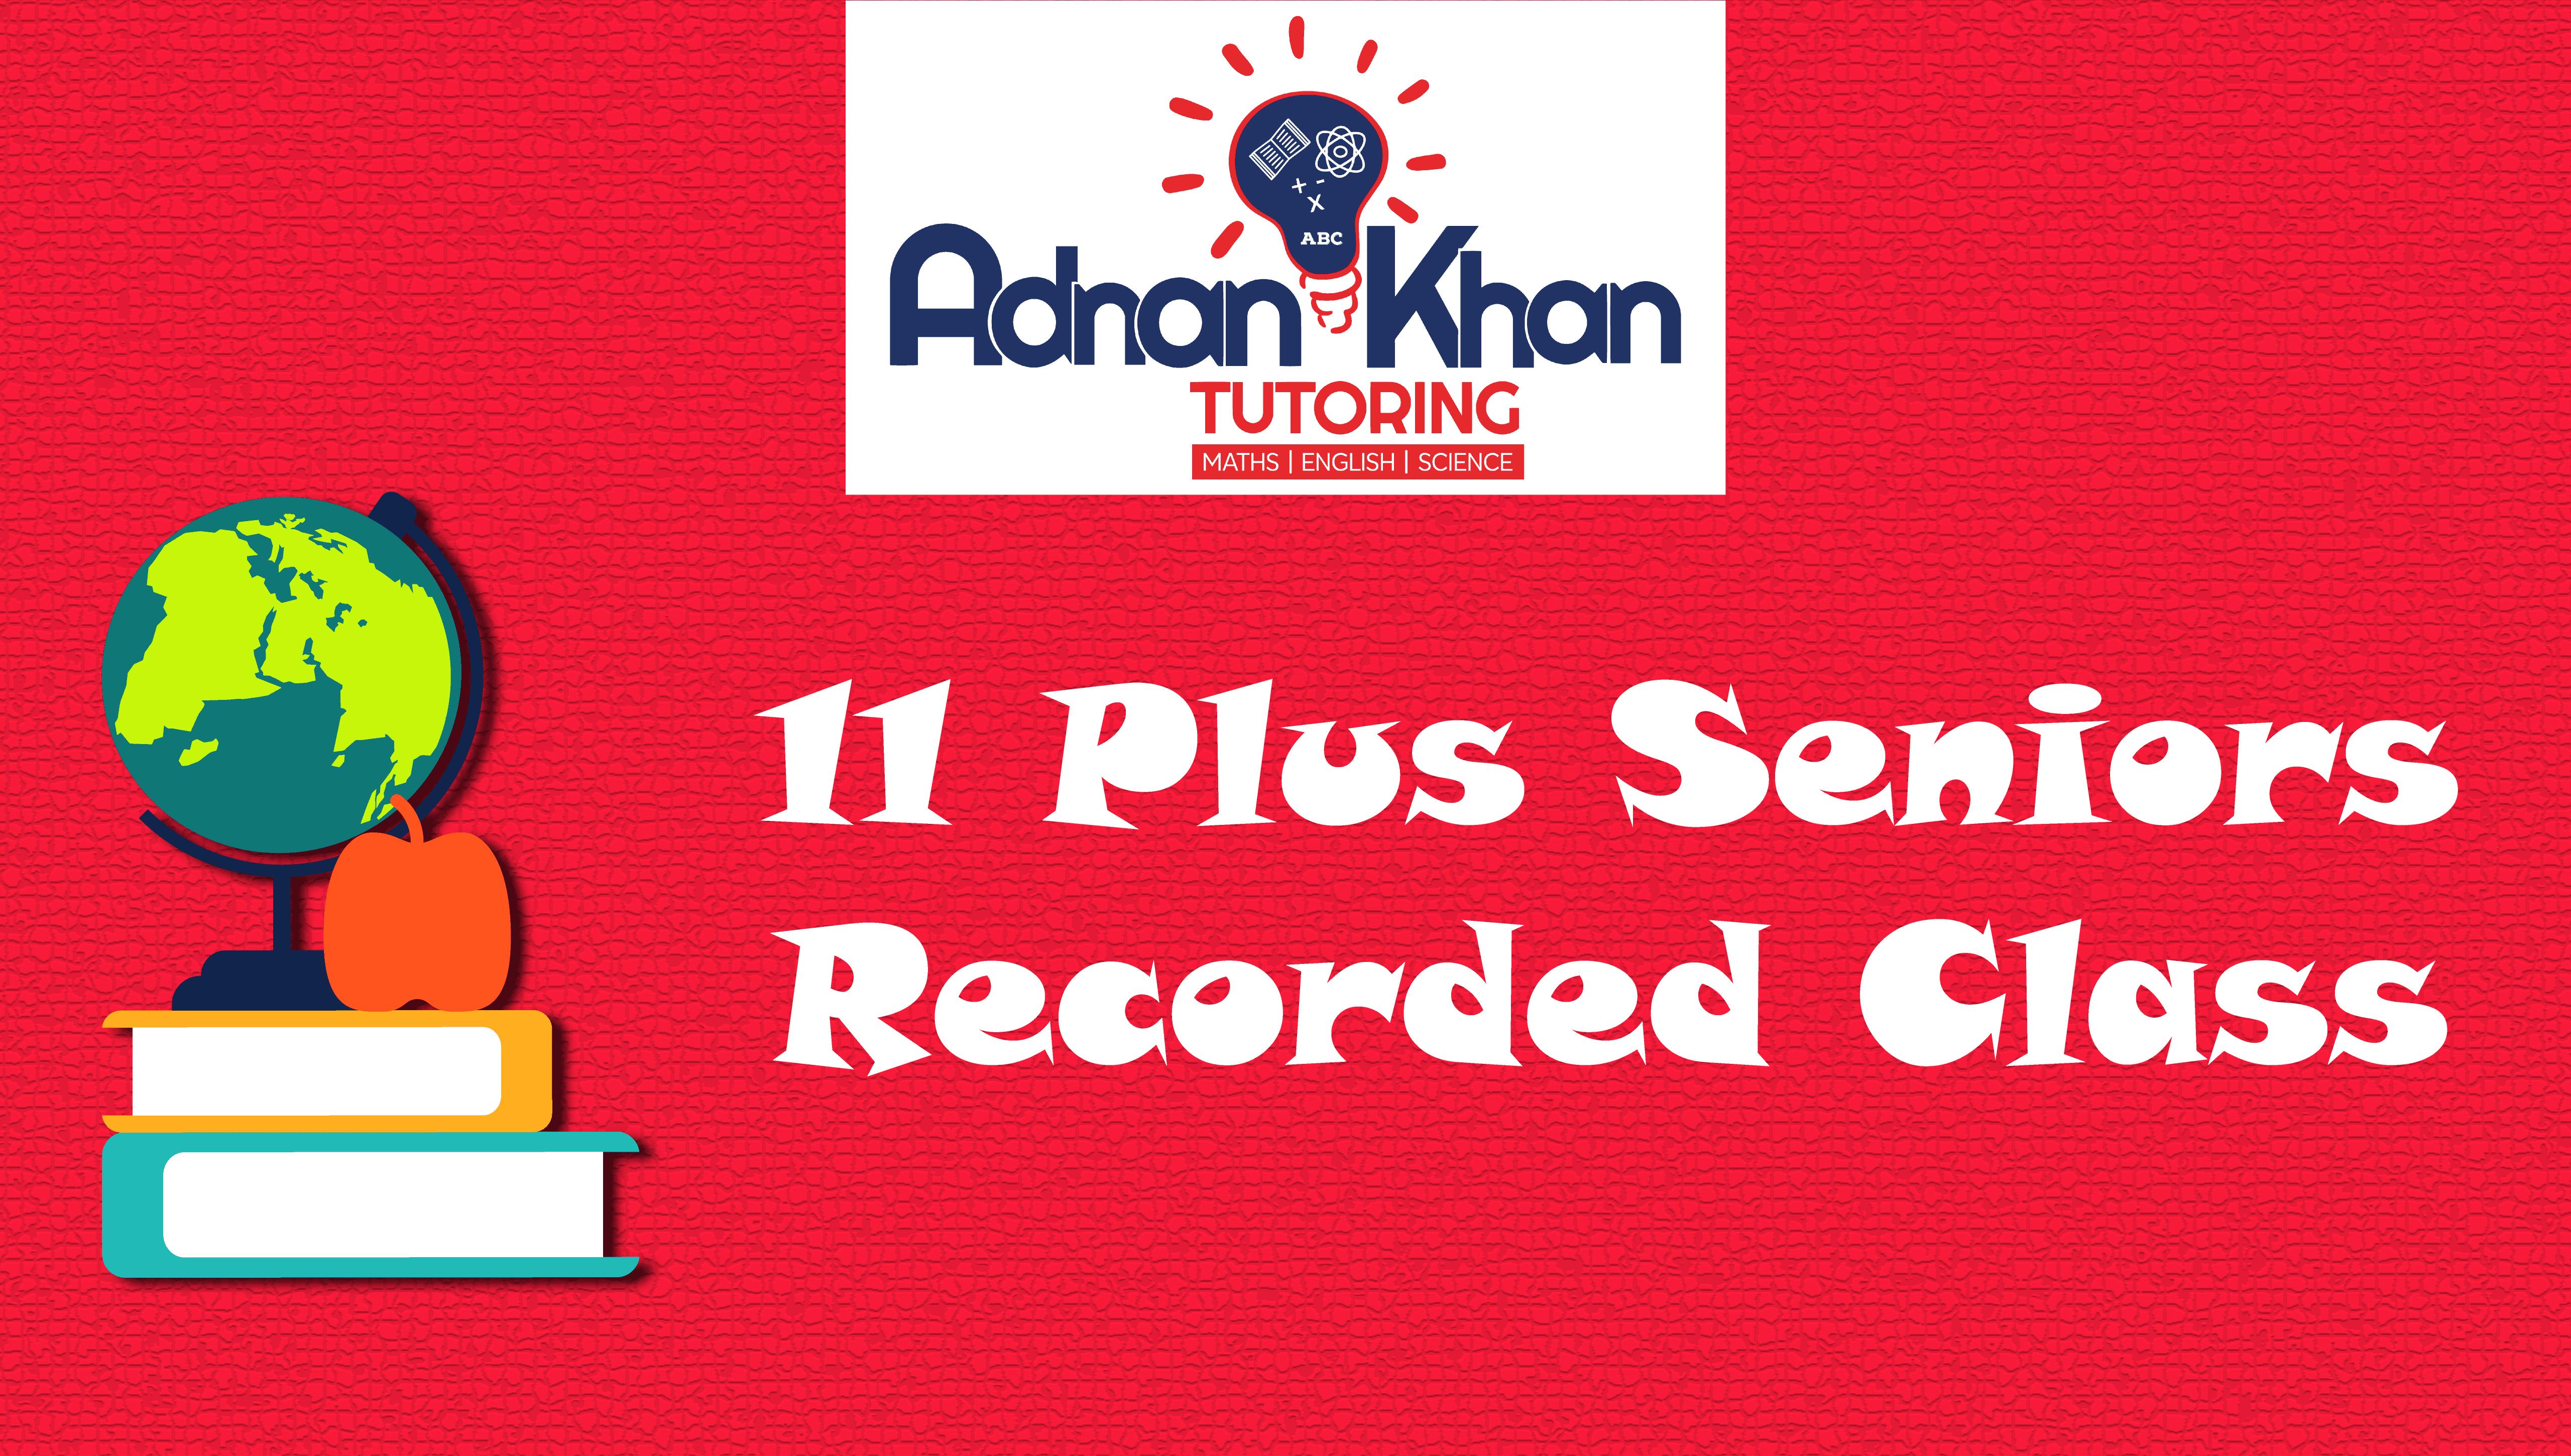 11 Plus Seniors – Recorded Class